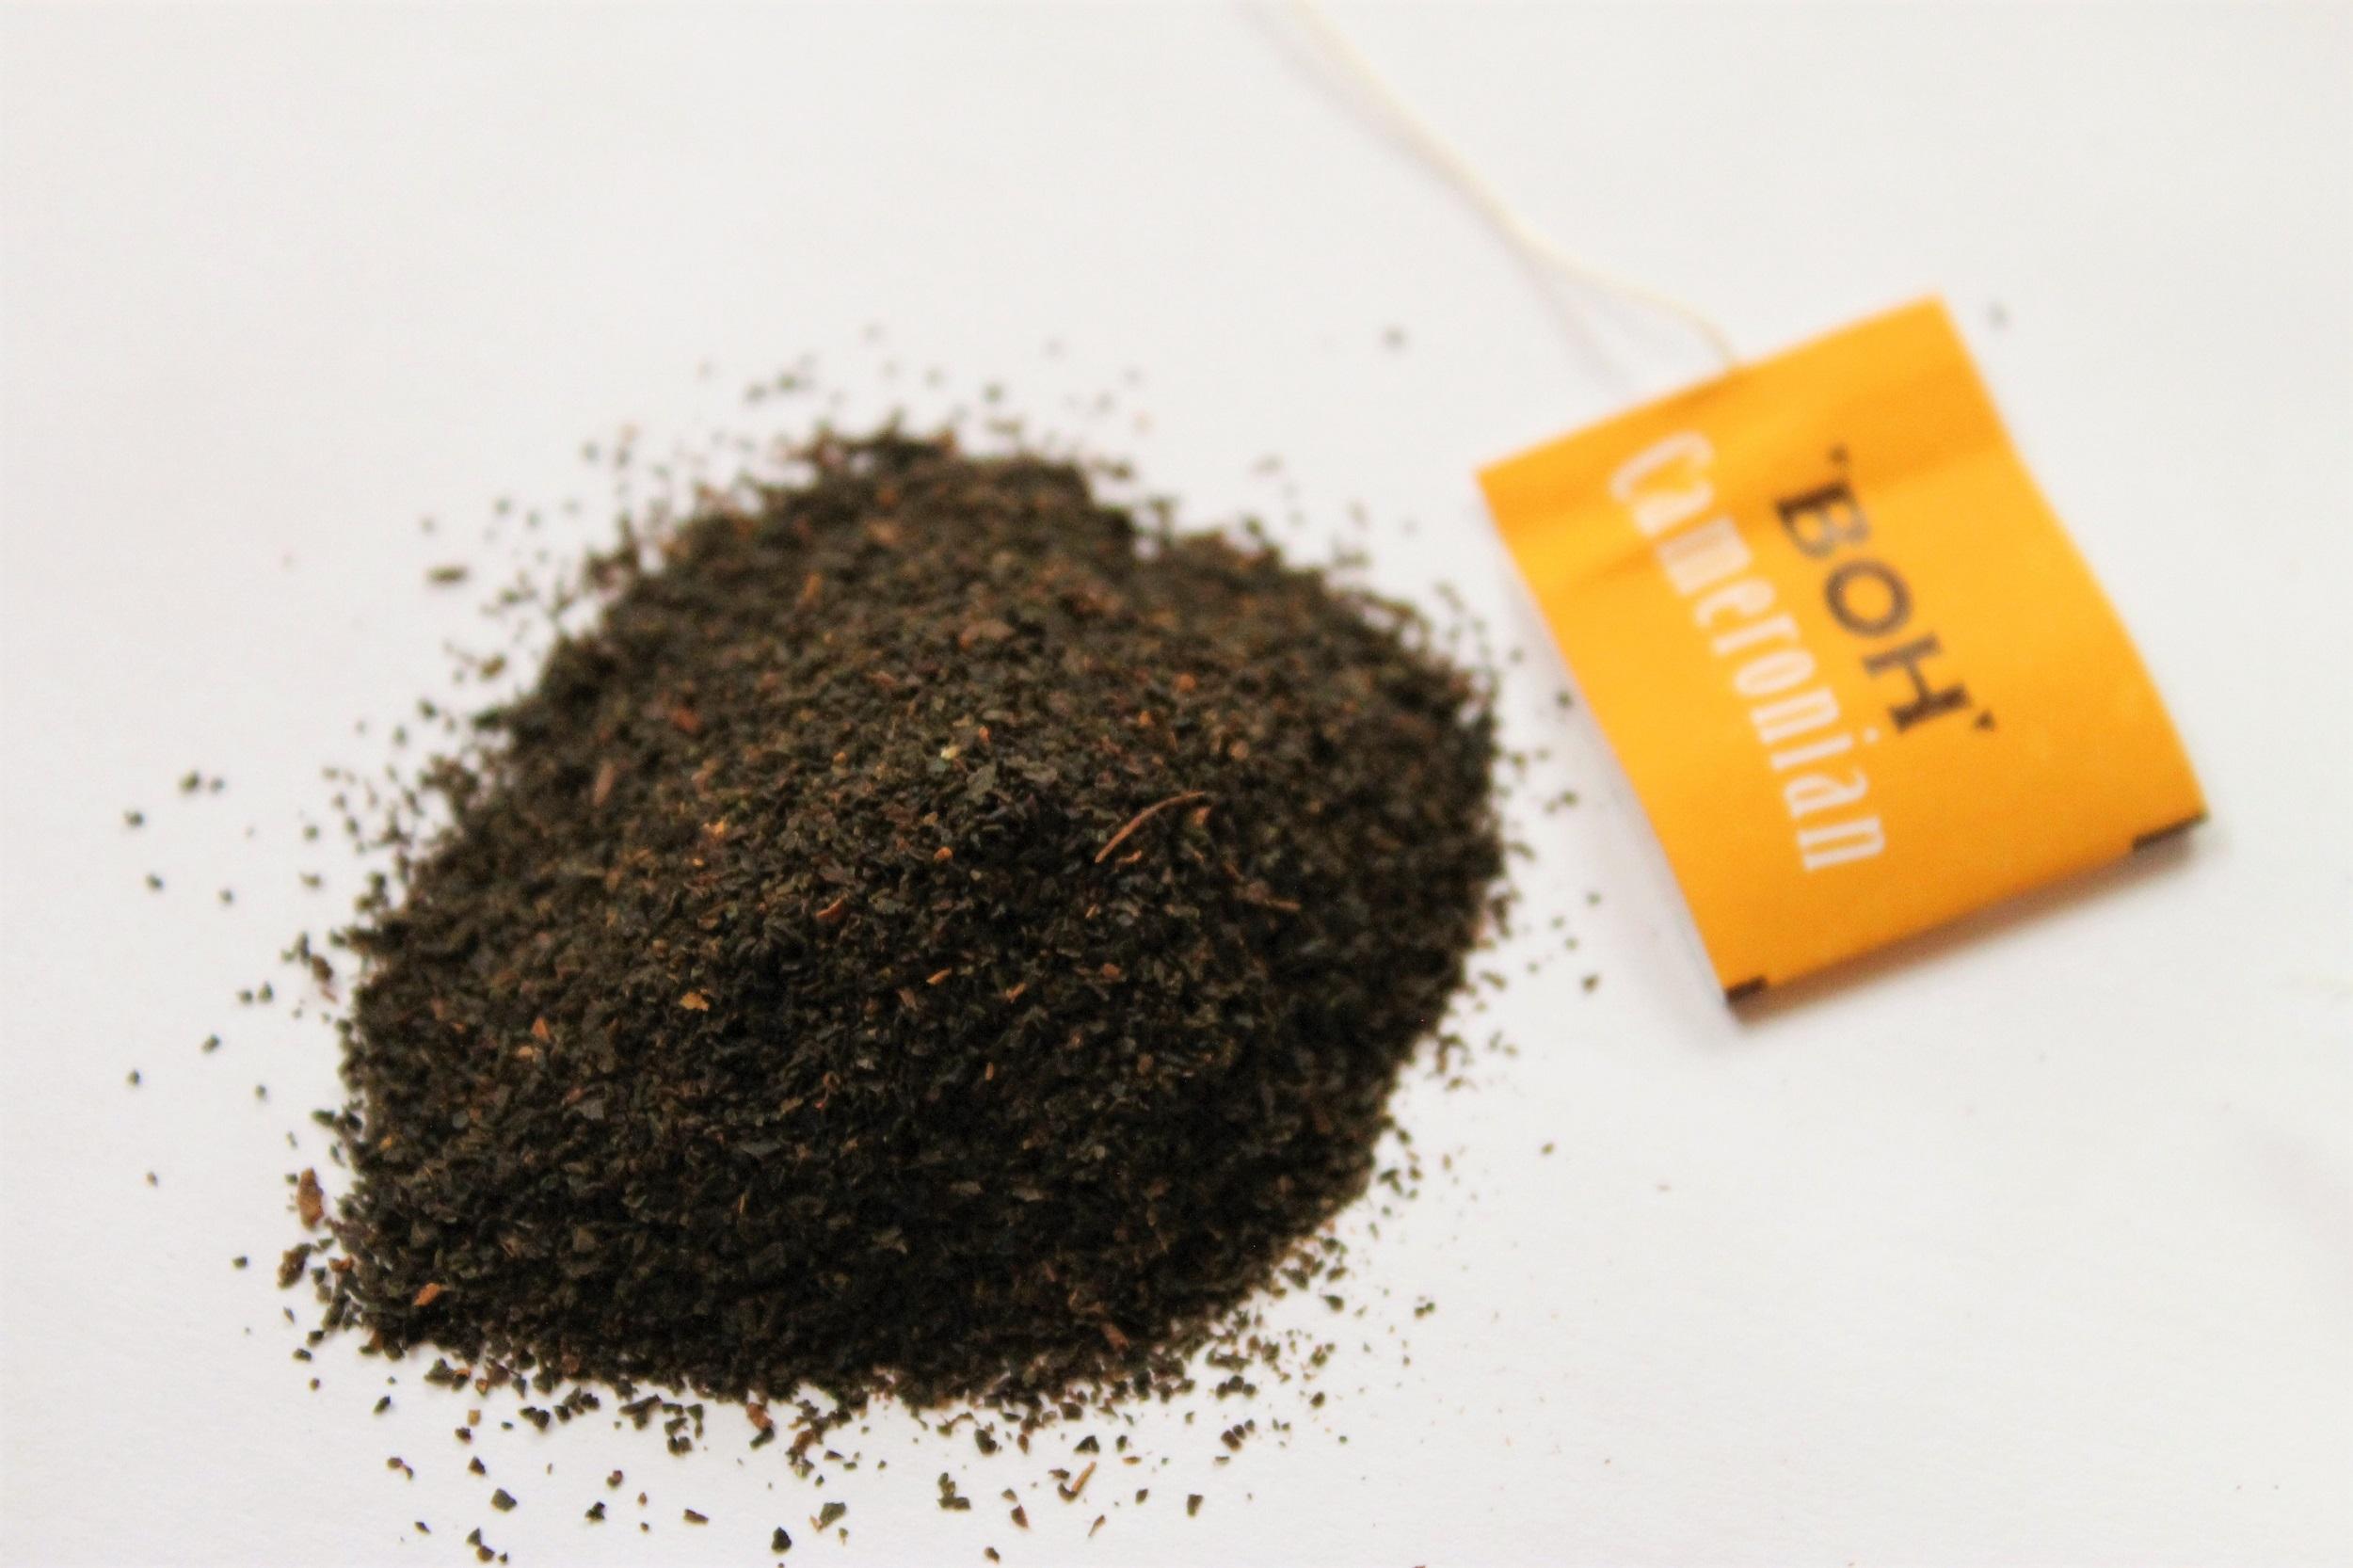 boh cameron highlands black tea